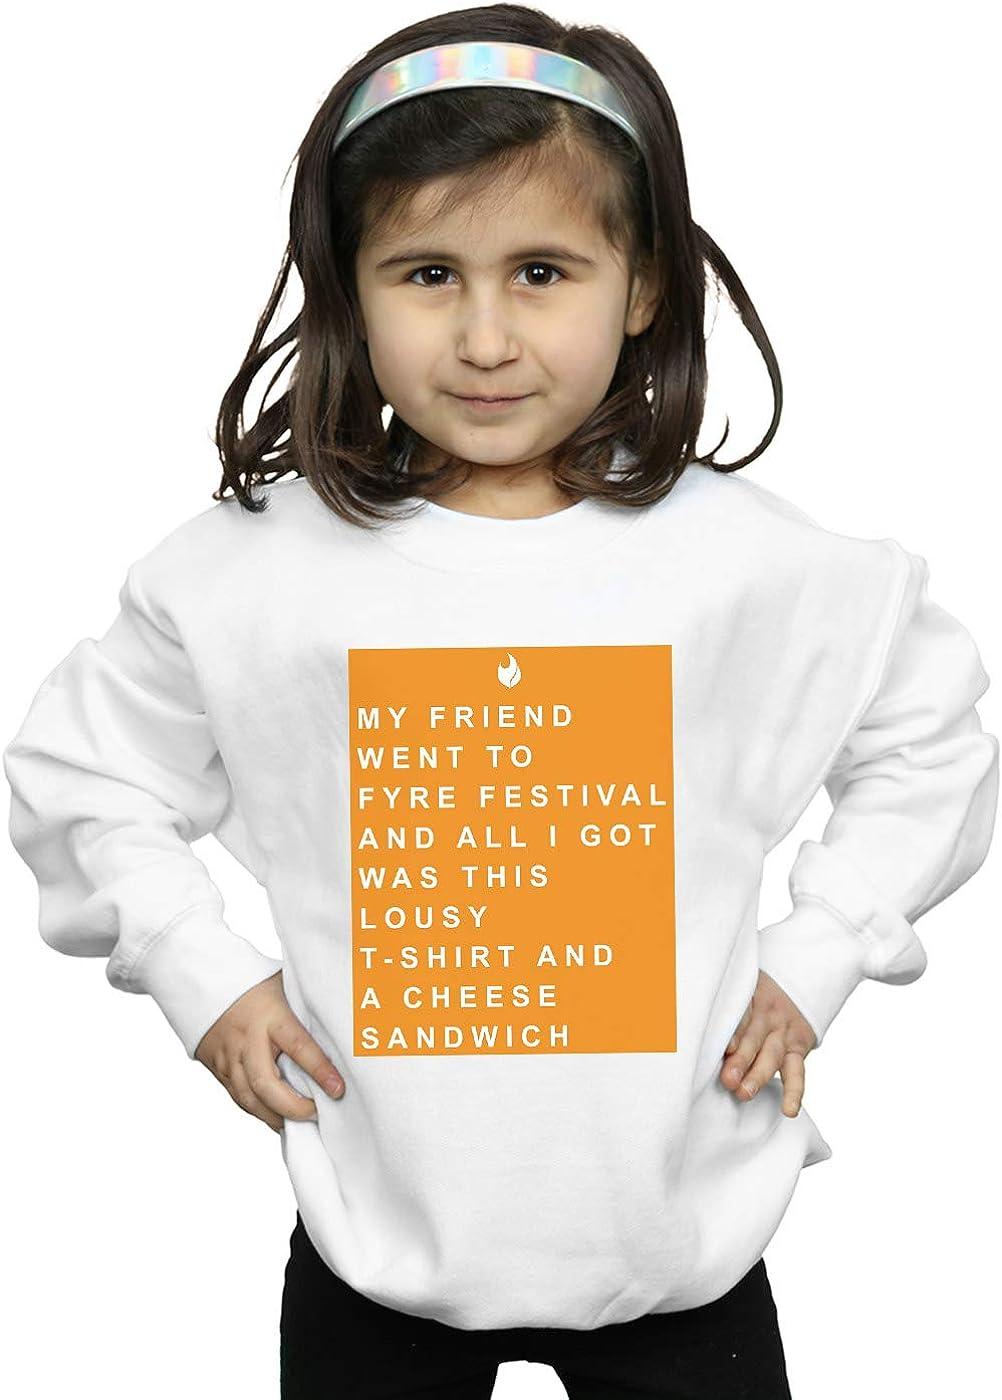 Absolute Cult Drewbacca Girls Fyre Festival Souvenir from Friend Orange Sweatshirt